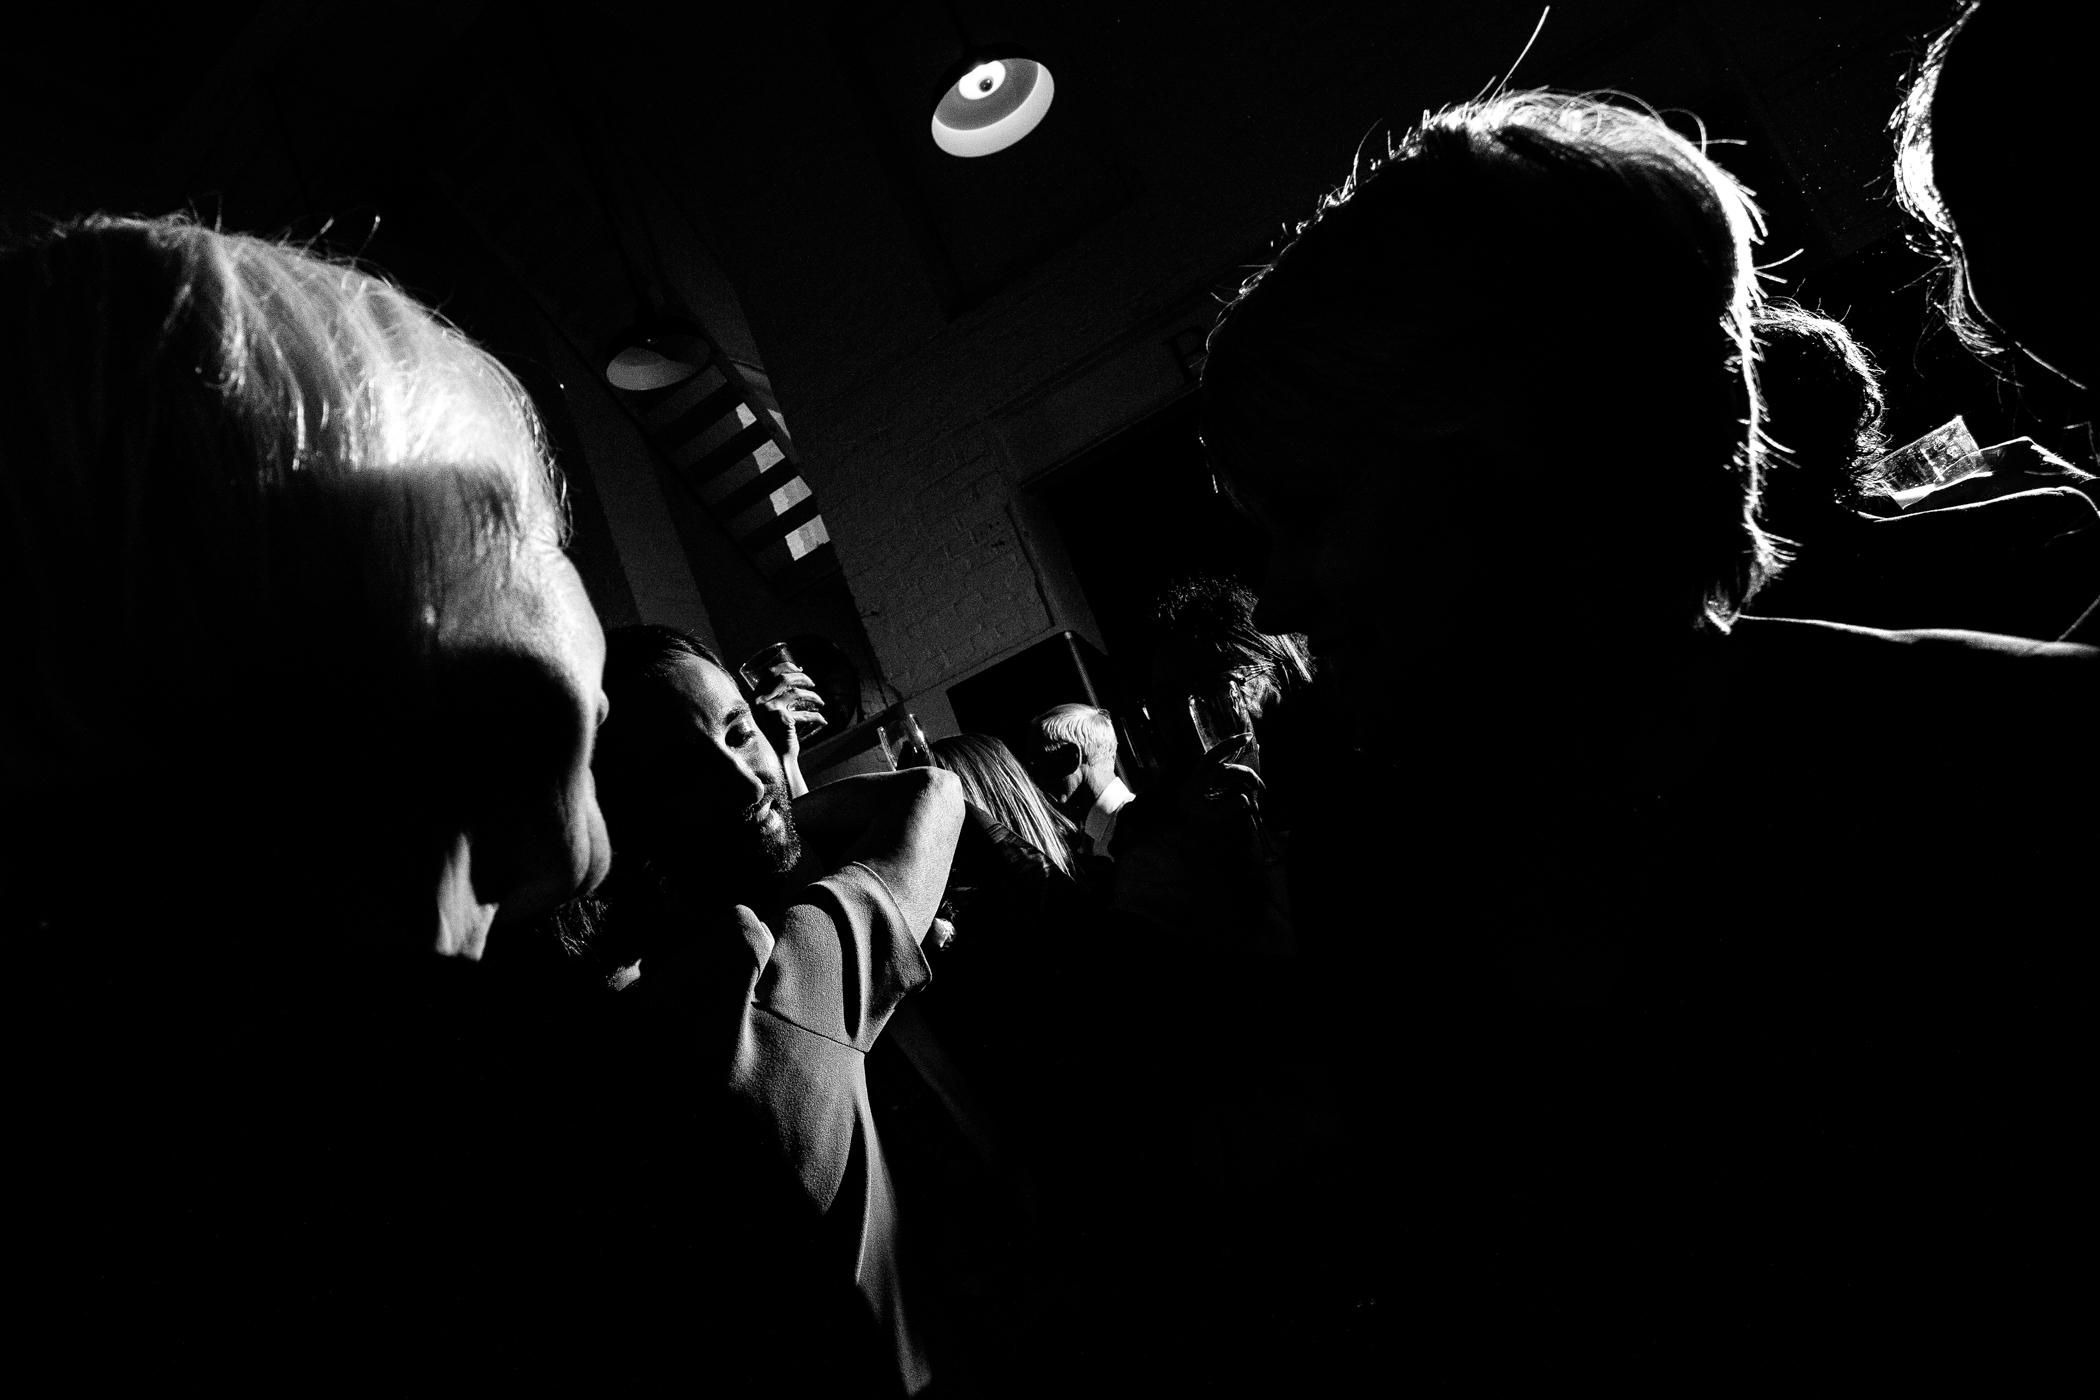 sansom photography london-105